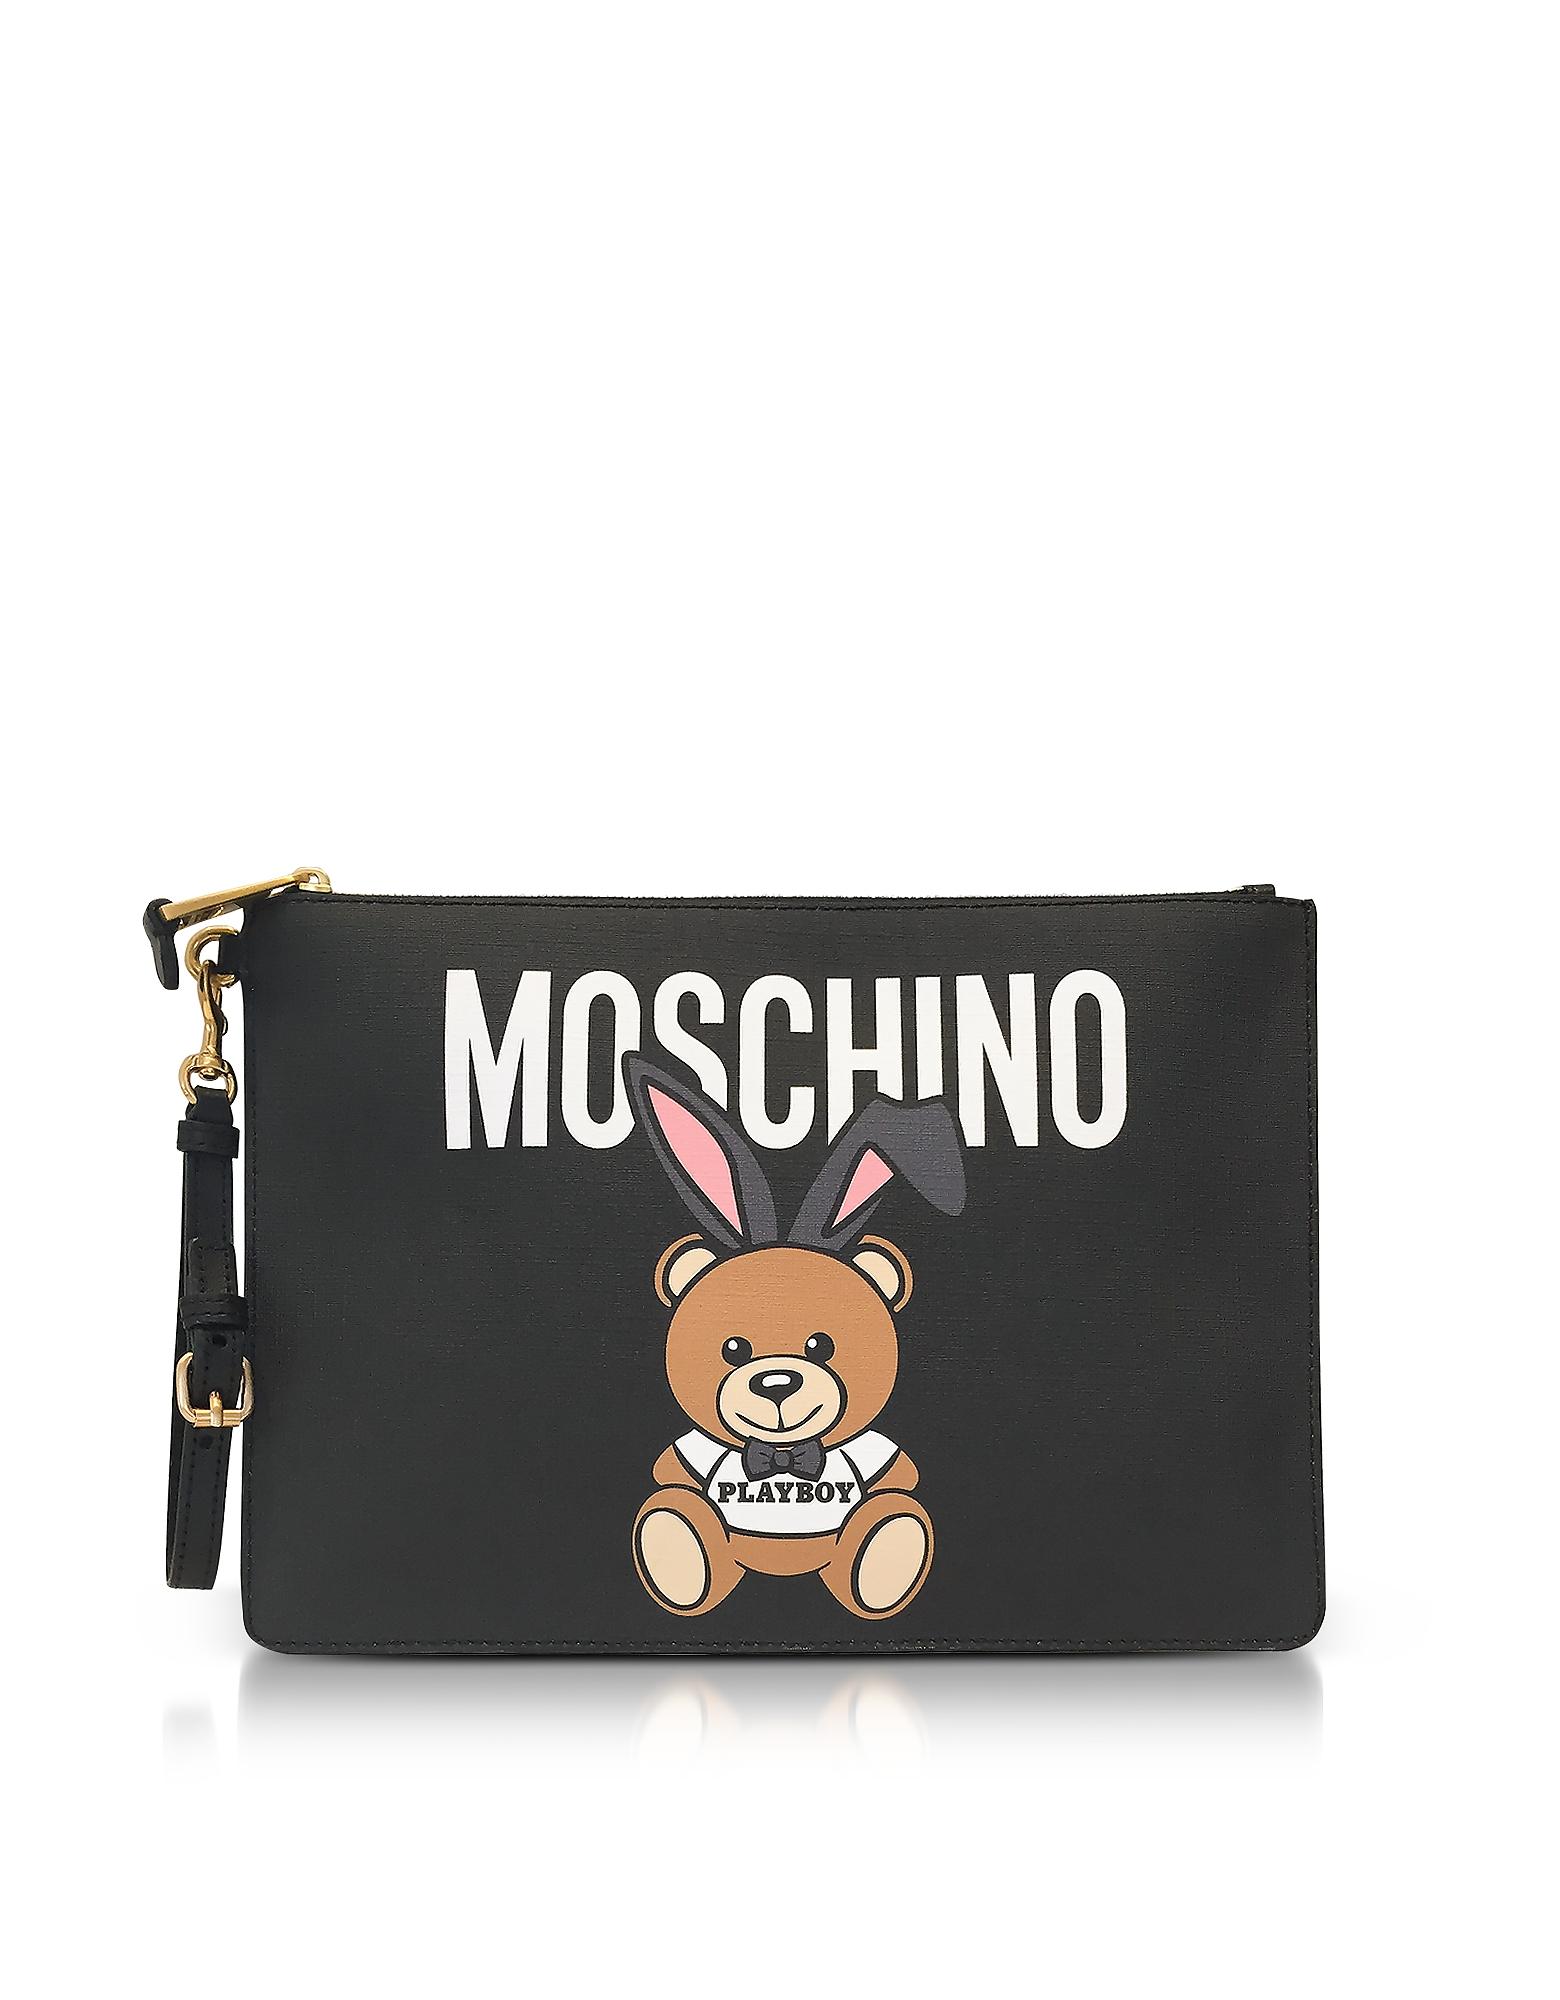 Moschino Teddy Playboy Print Saffiano Leather Oversized Clutch